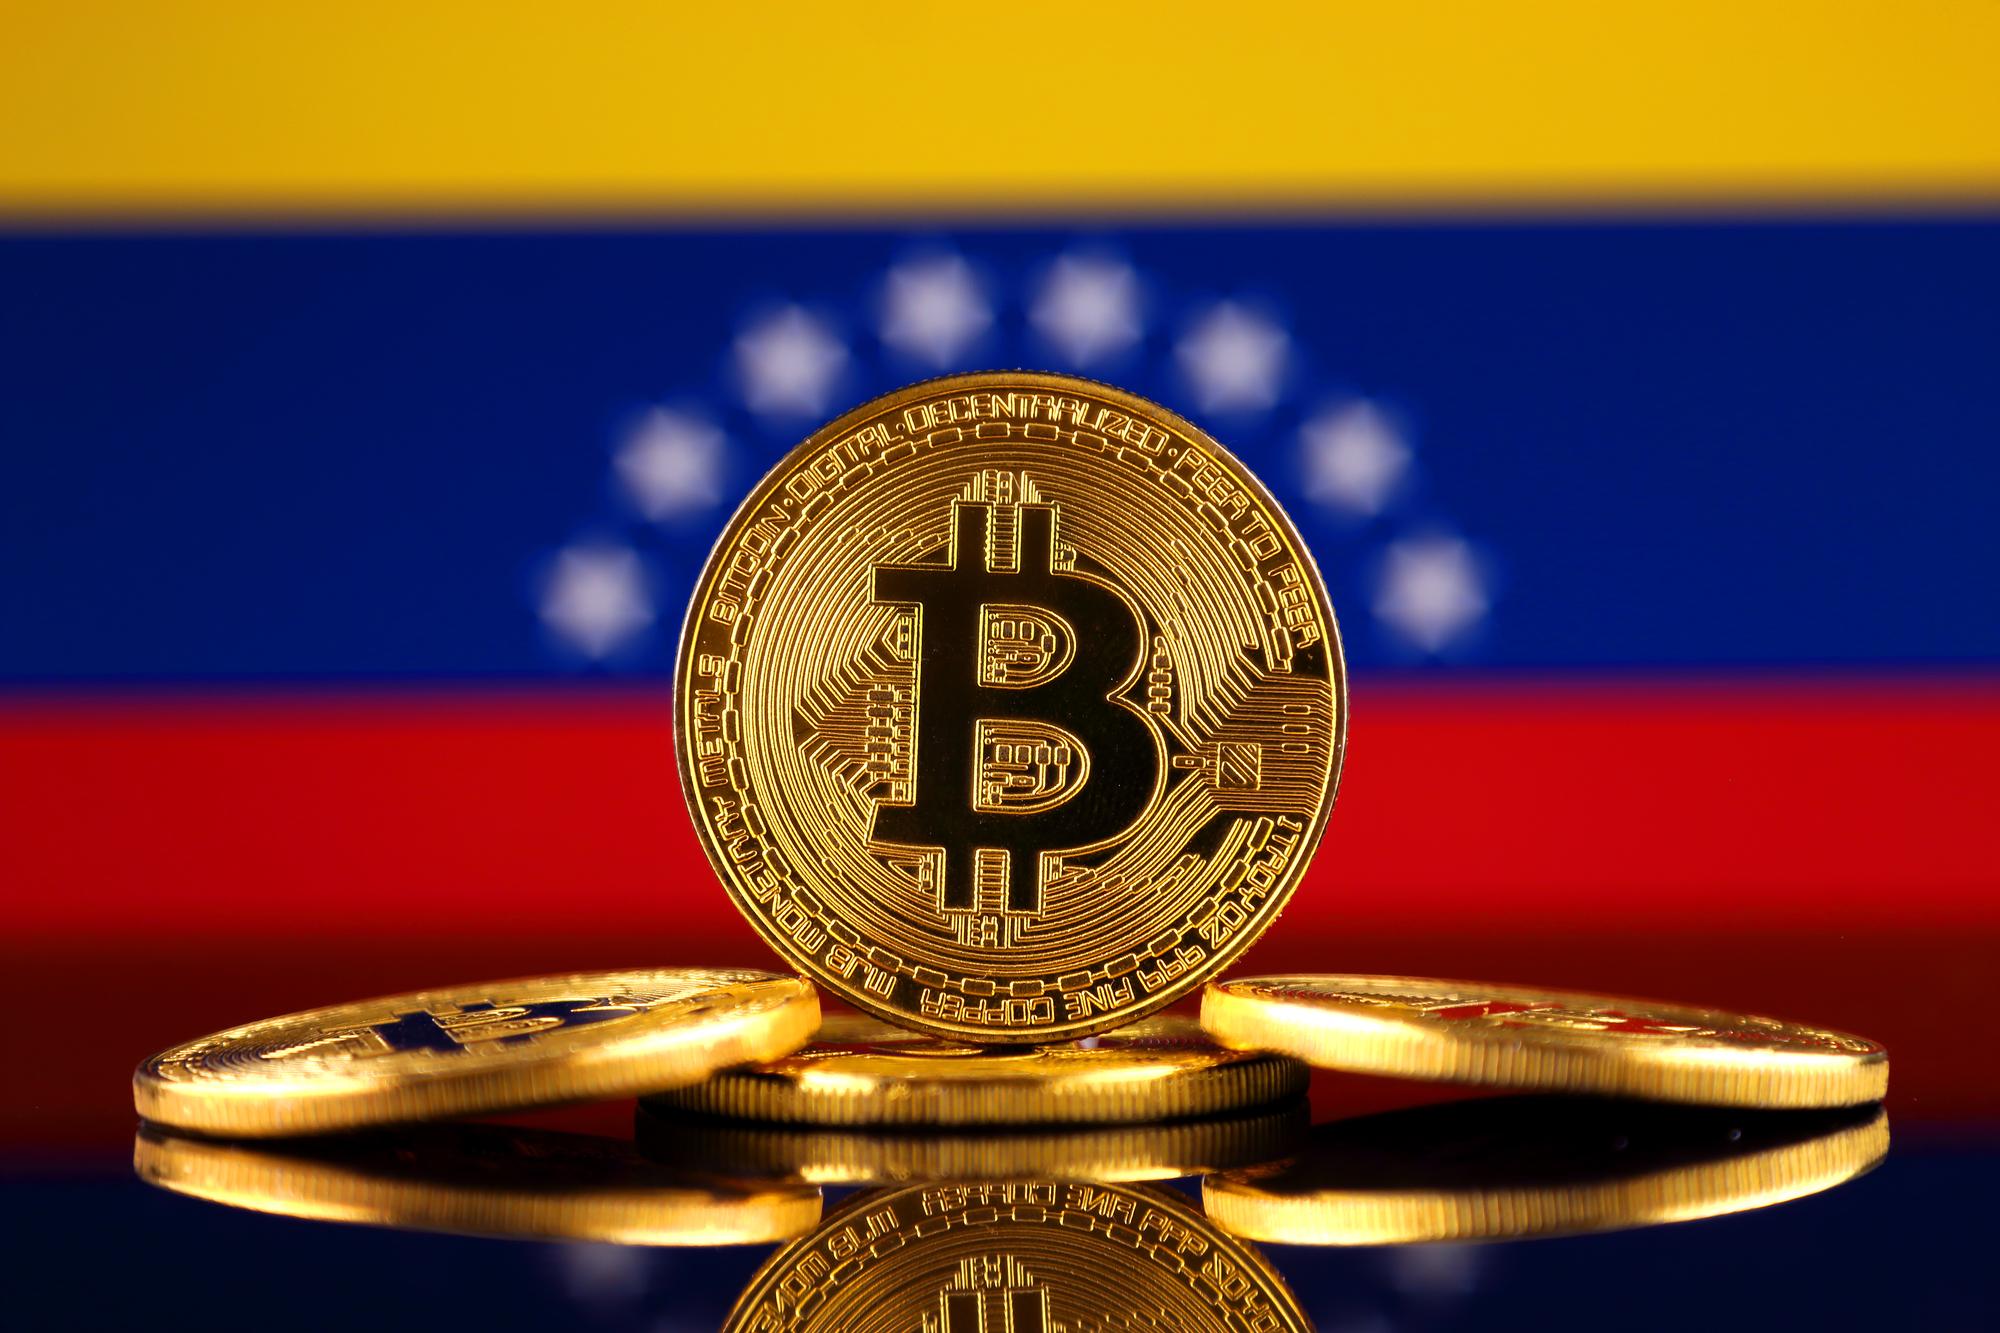 venezuellada bitcoin kullanimi hakim konuma geldi